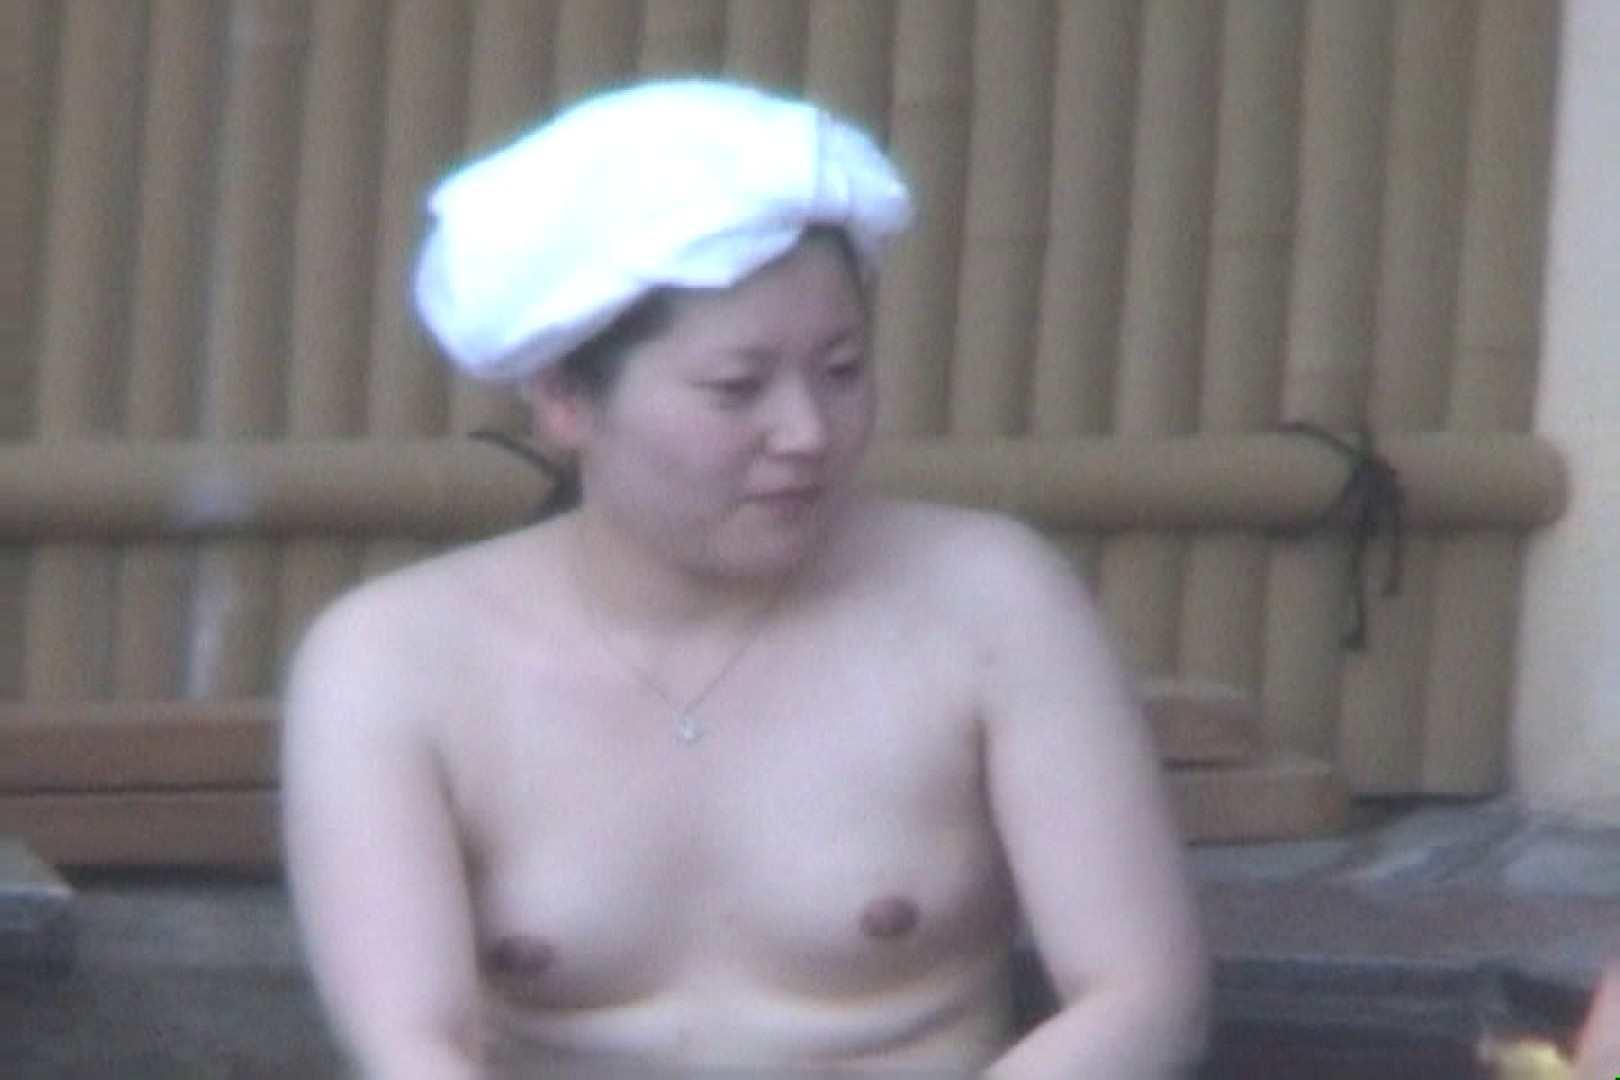 Aquaな露天風呂Vol.86【VIP限定】 盗撮師作品  94pic 24